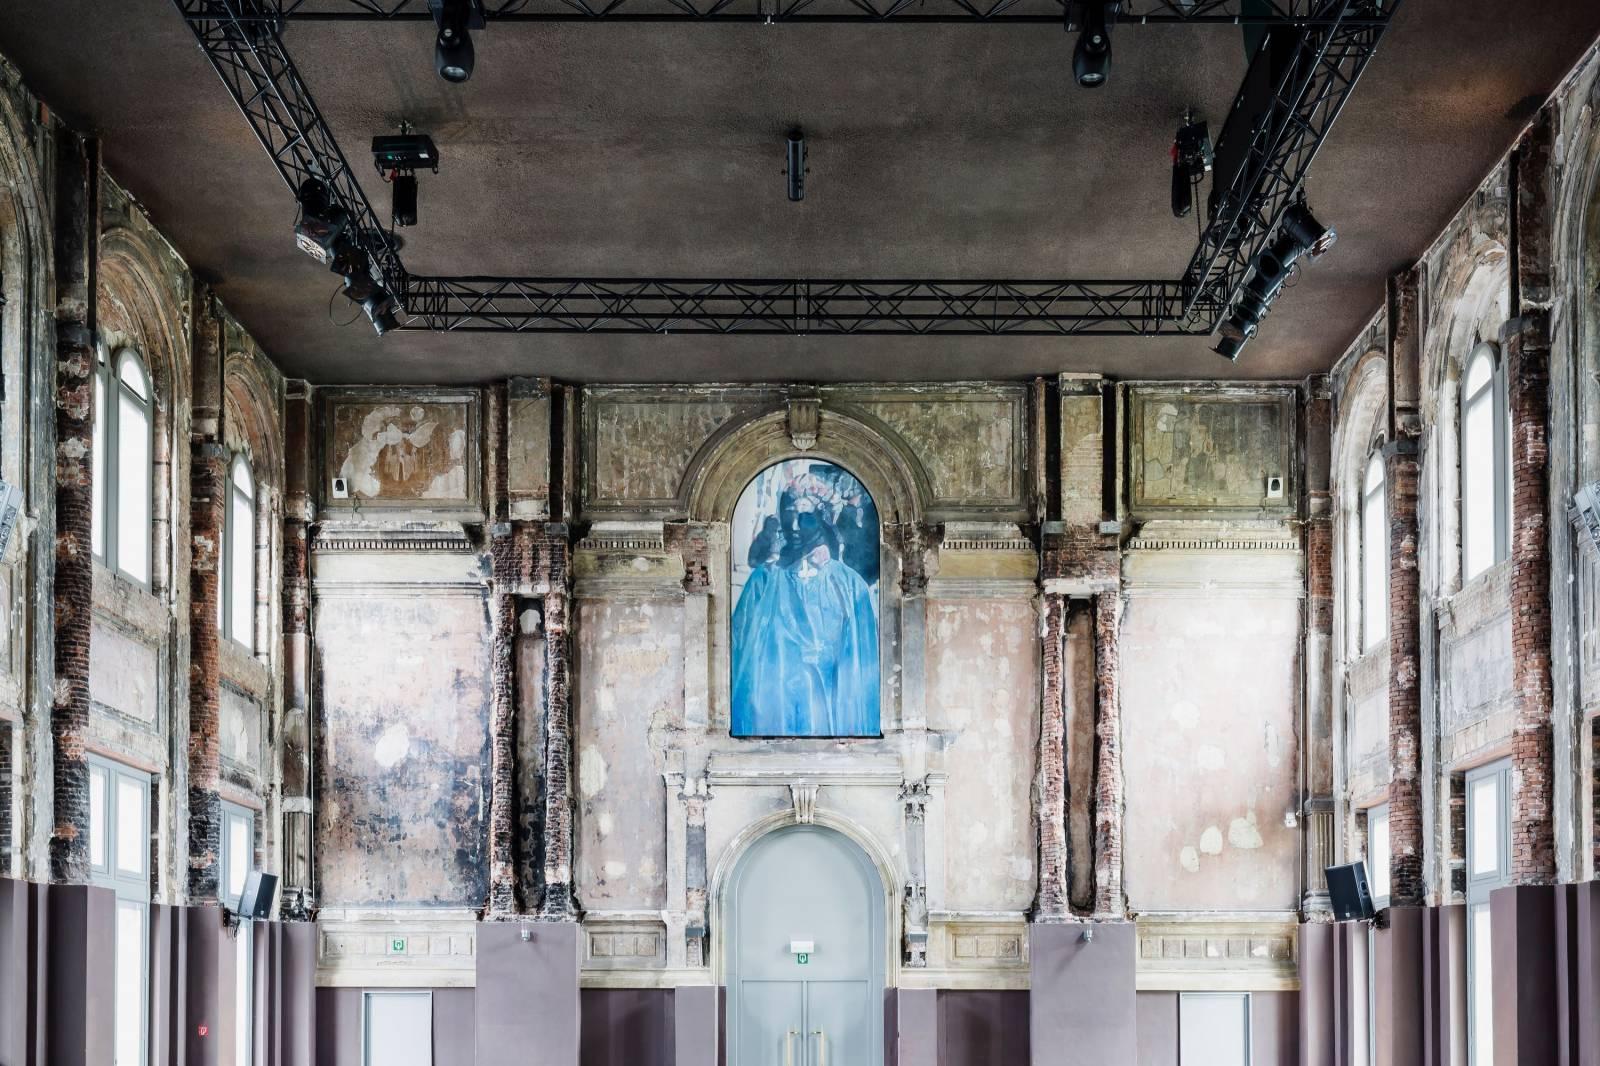 Zaal AthenA - Feestzaal - Trouwzaal - Antwerpen - House of Weddings - 3